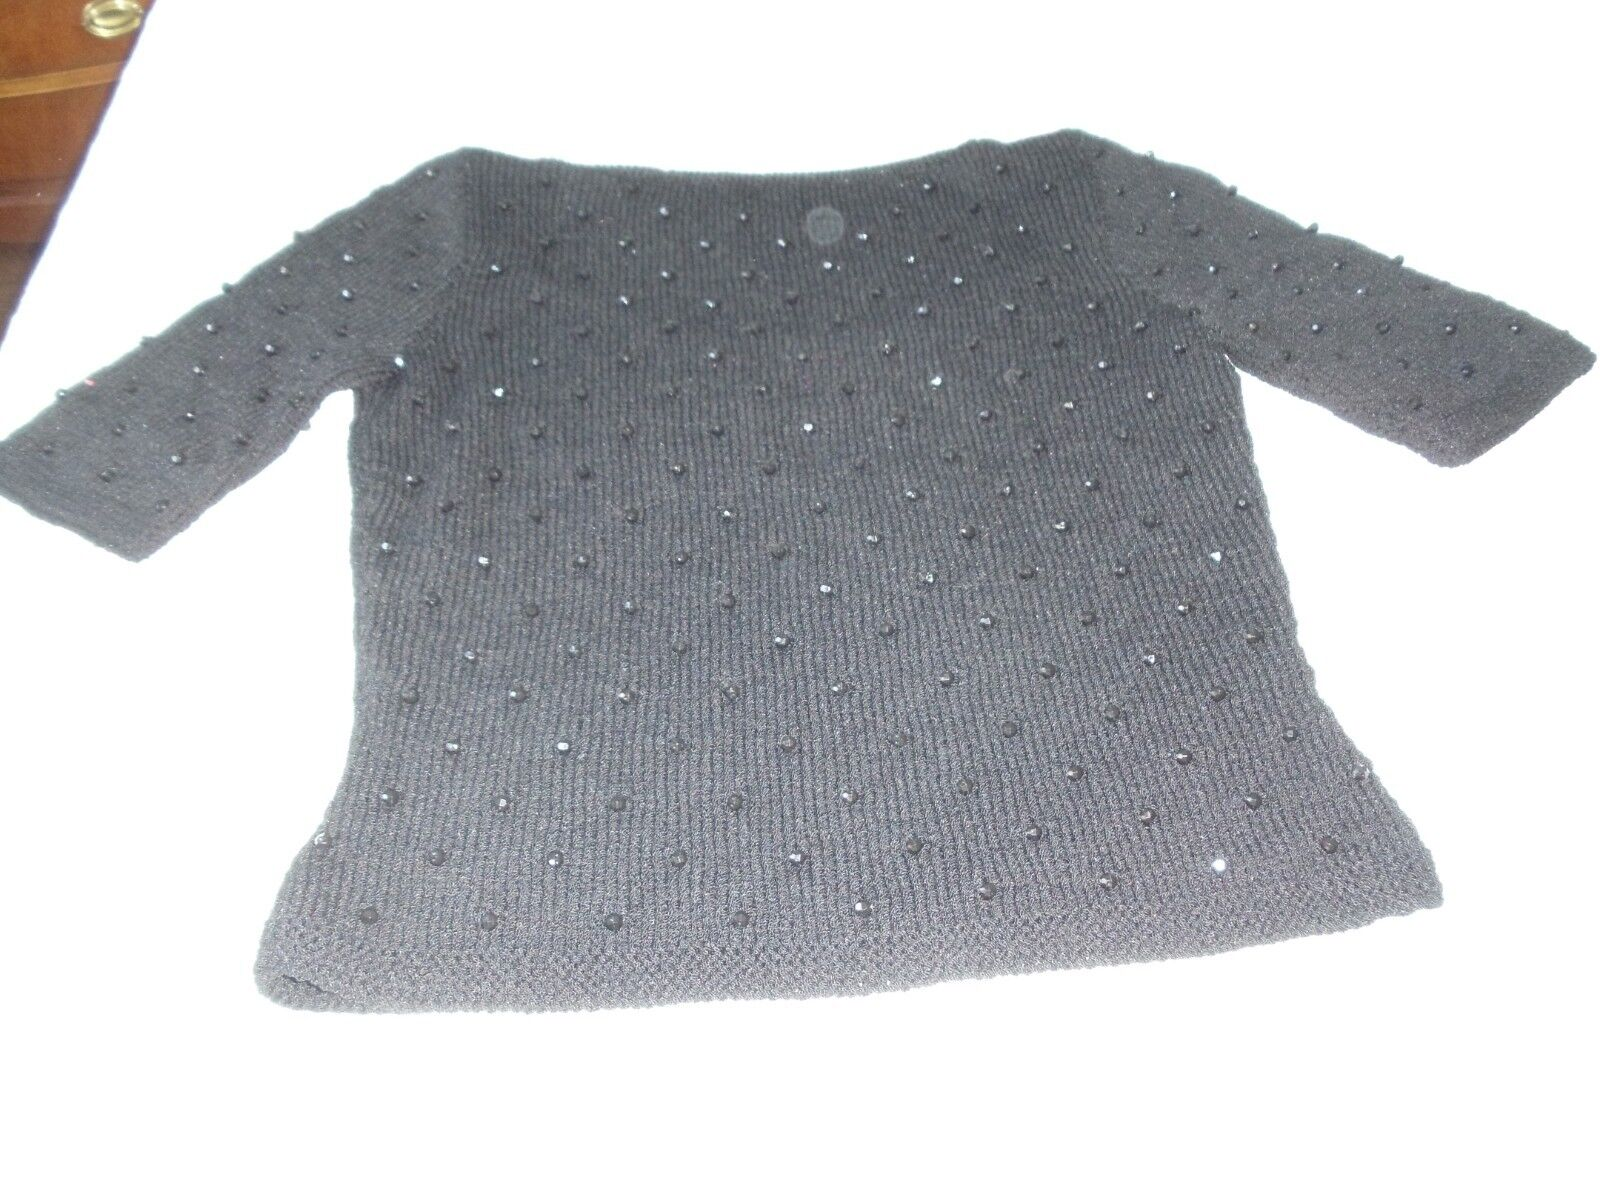 schwarz STEVEN STOLMAN Knit Top